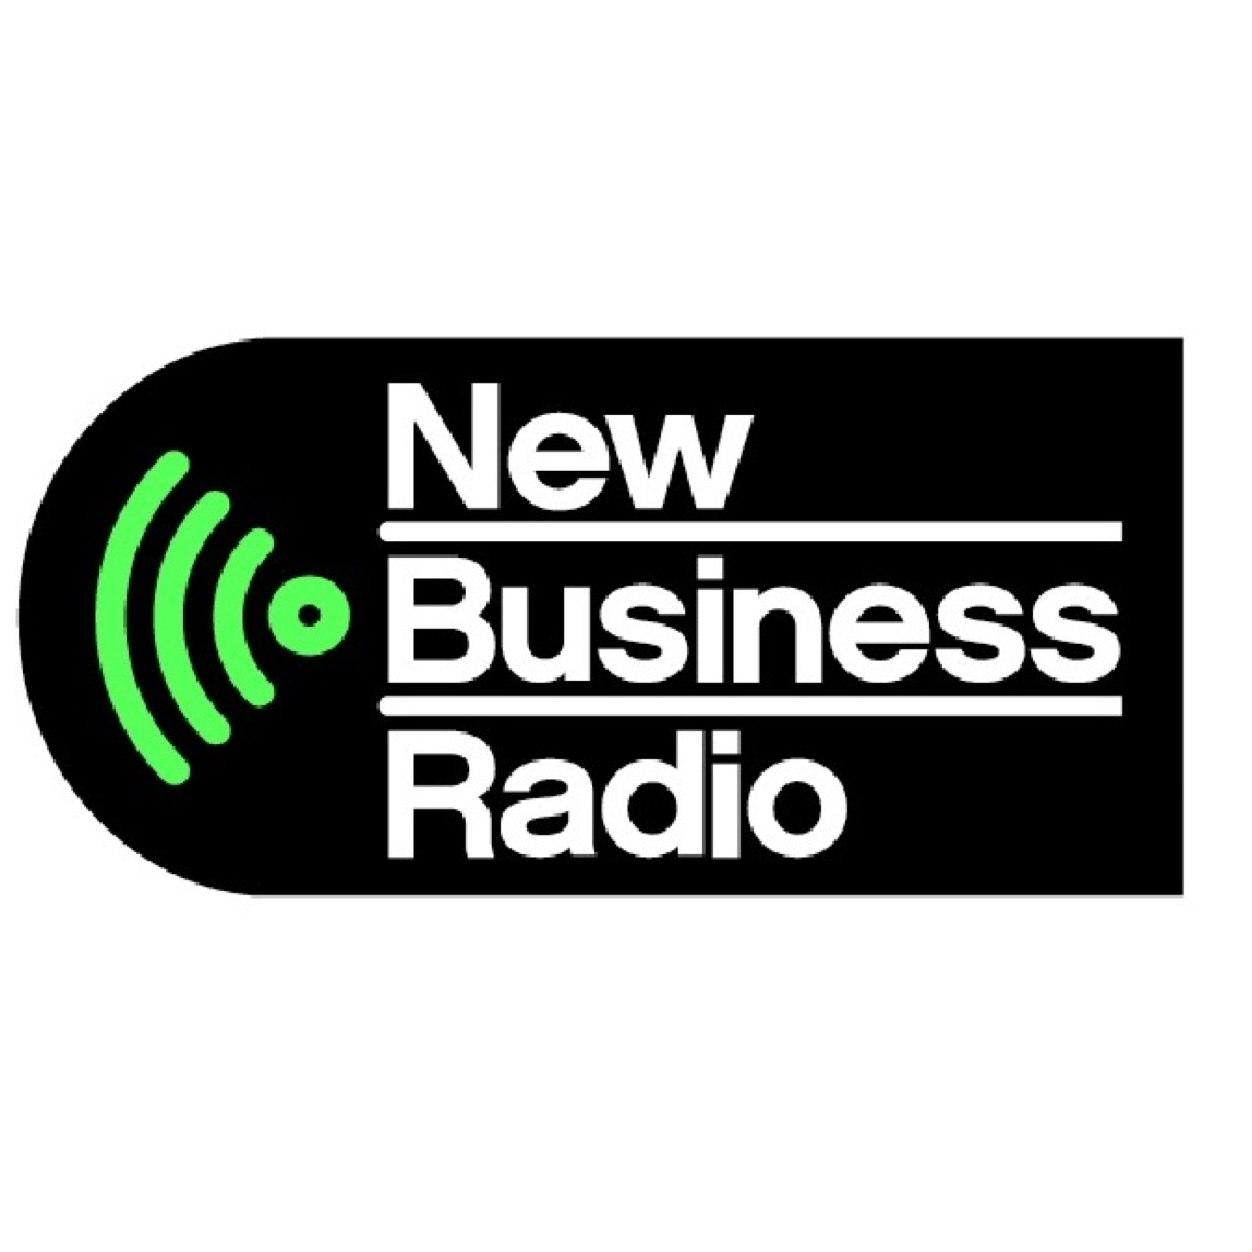 New business radio.jpg